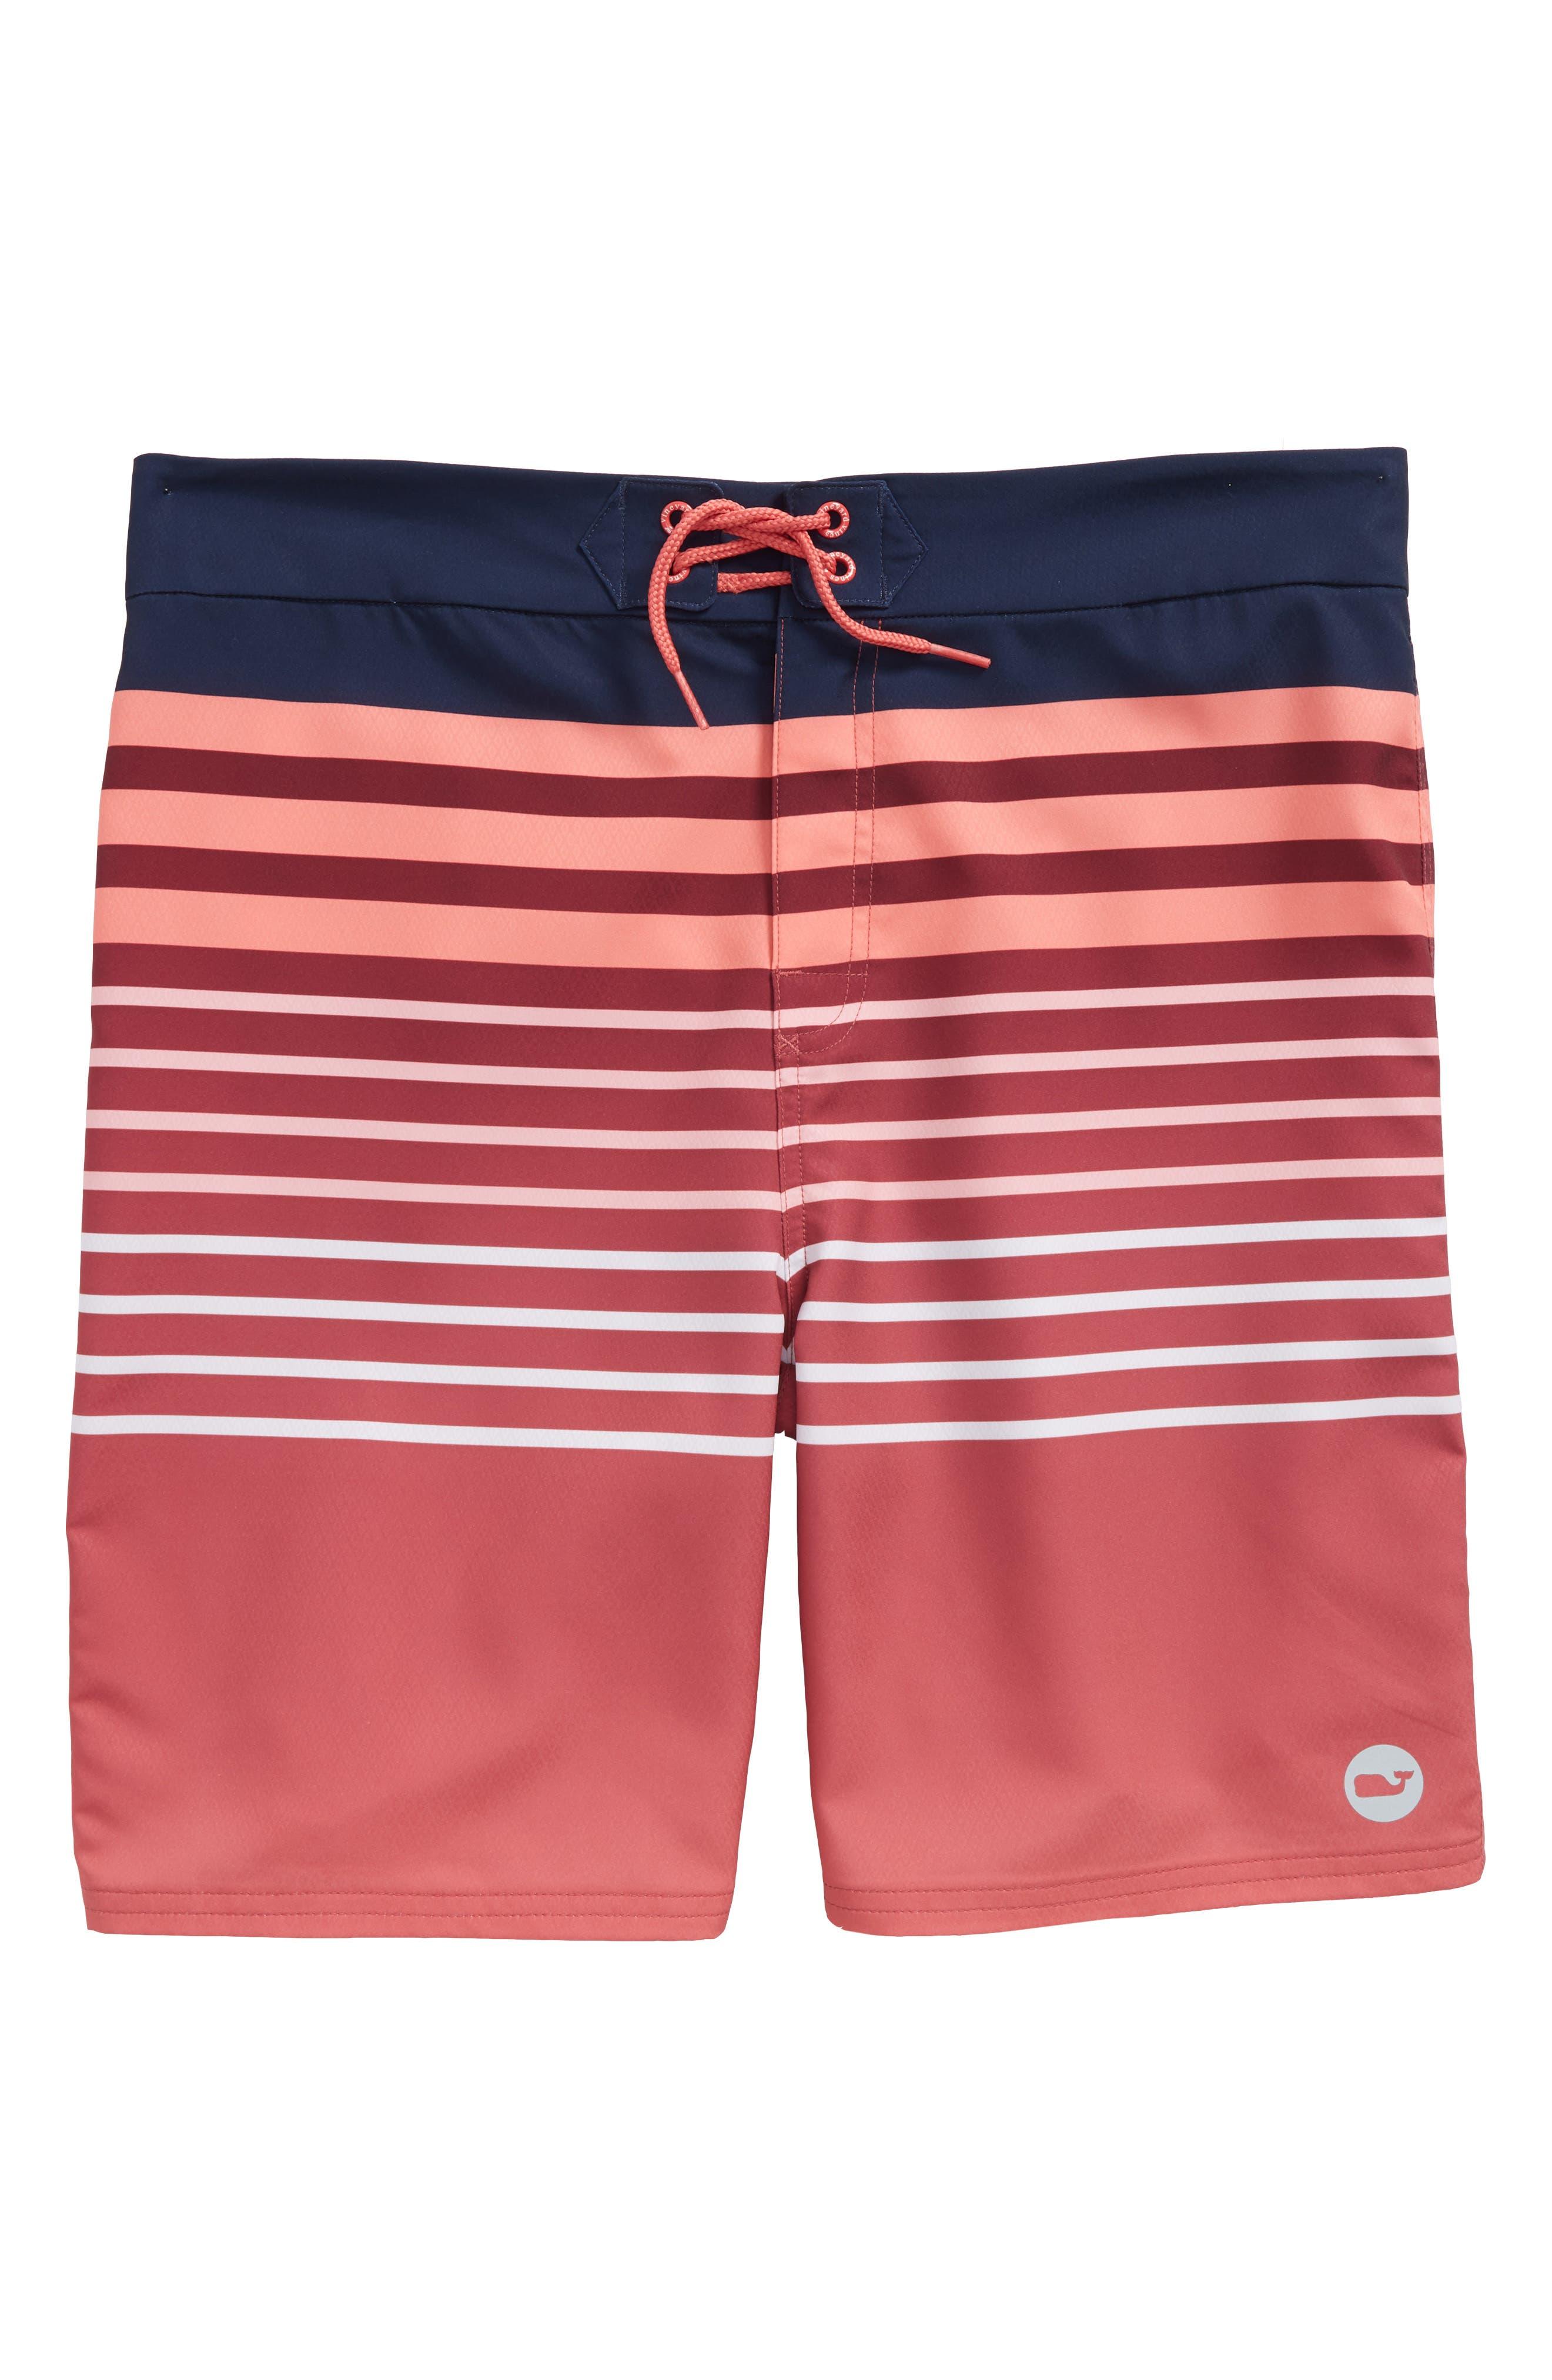 Surflodge Stripe Board Shorts,                             Main thumbnail 1, color,                             628